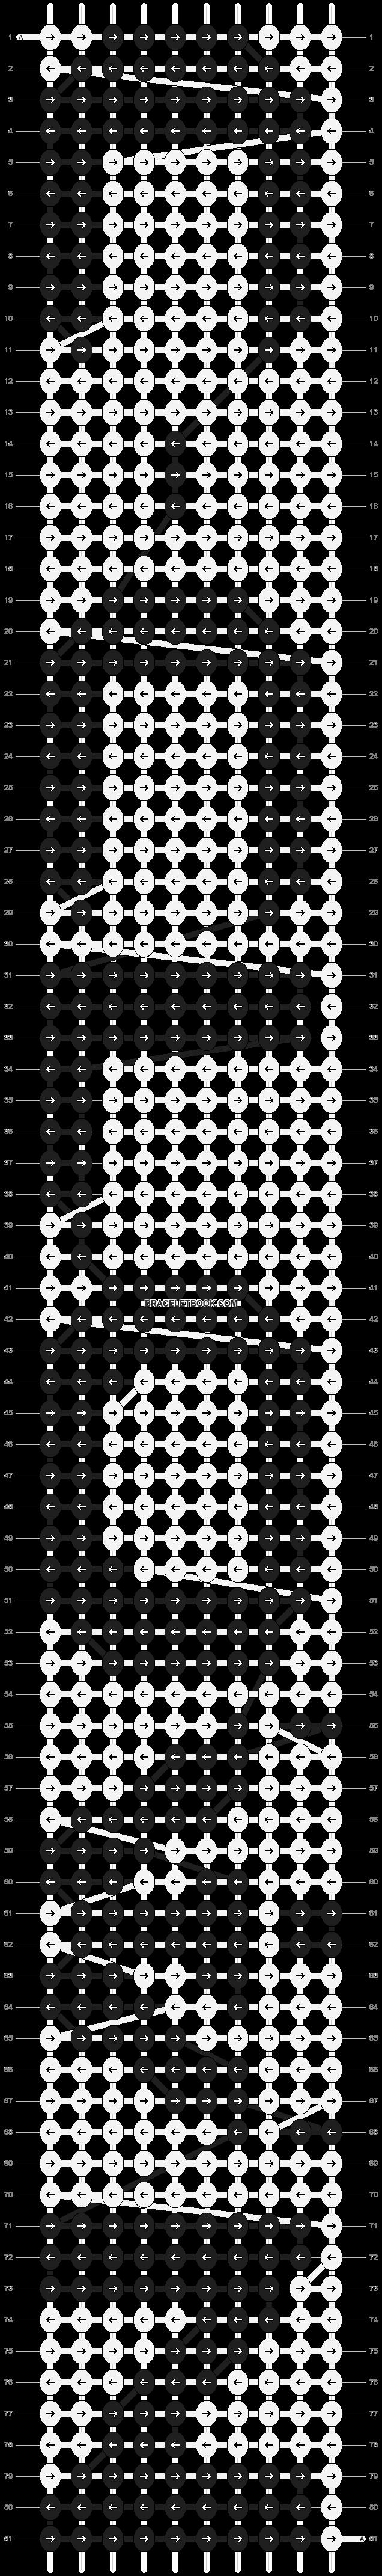 Alpha pattern #9020 pattern